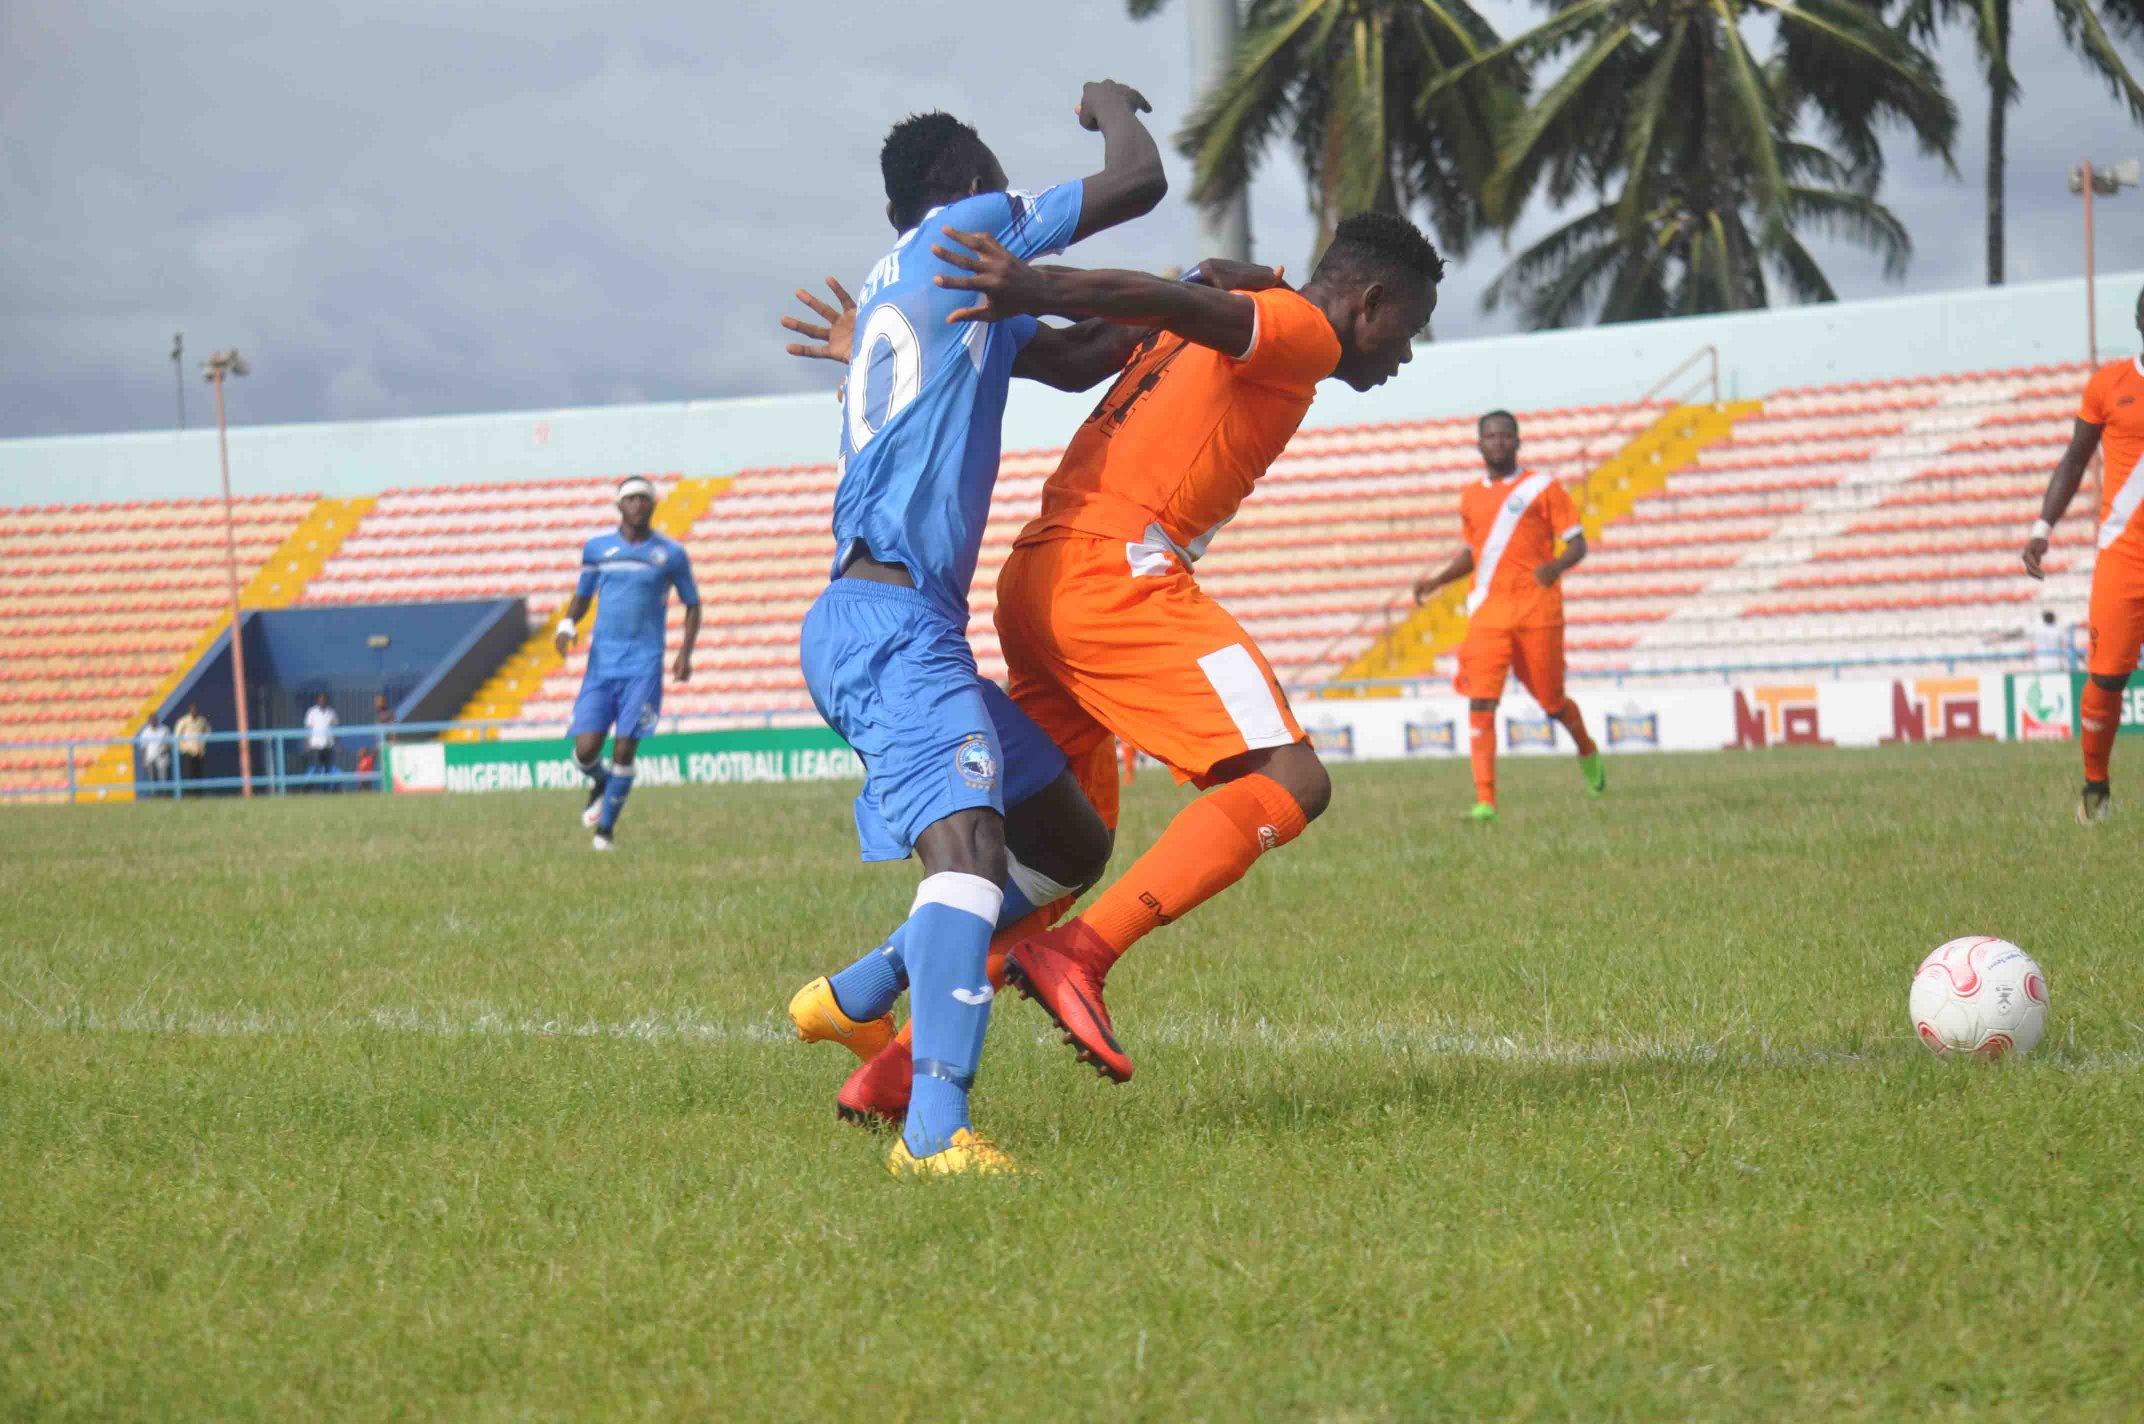 NPFL: Ezenwa Keeps Clean Sheet As Enyimba Outscore Go Round